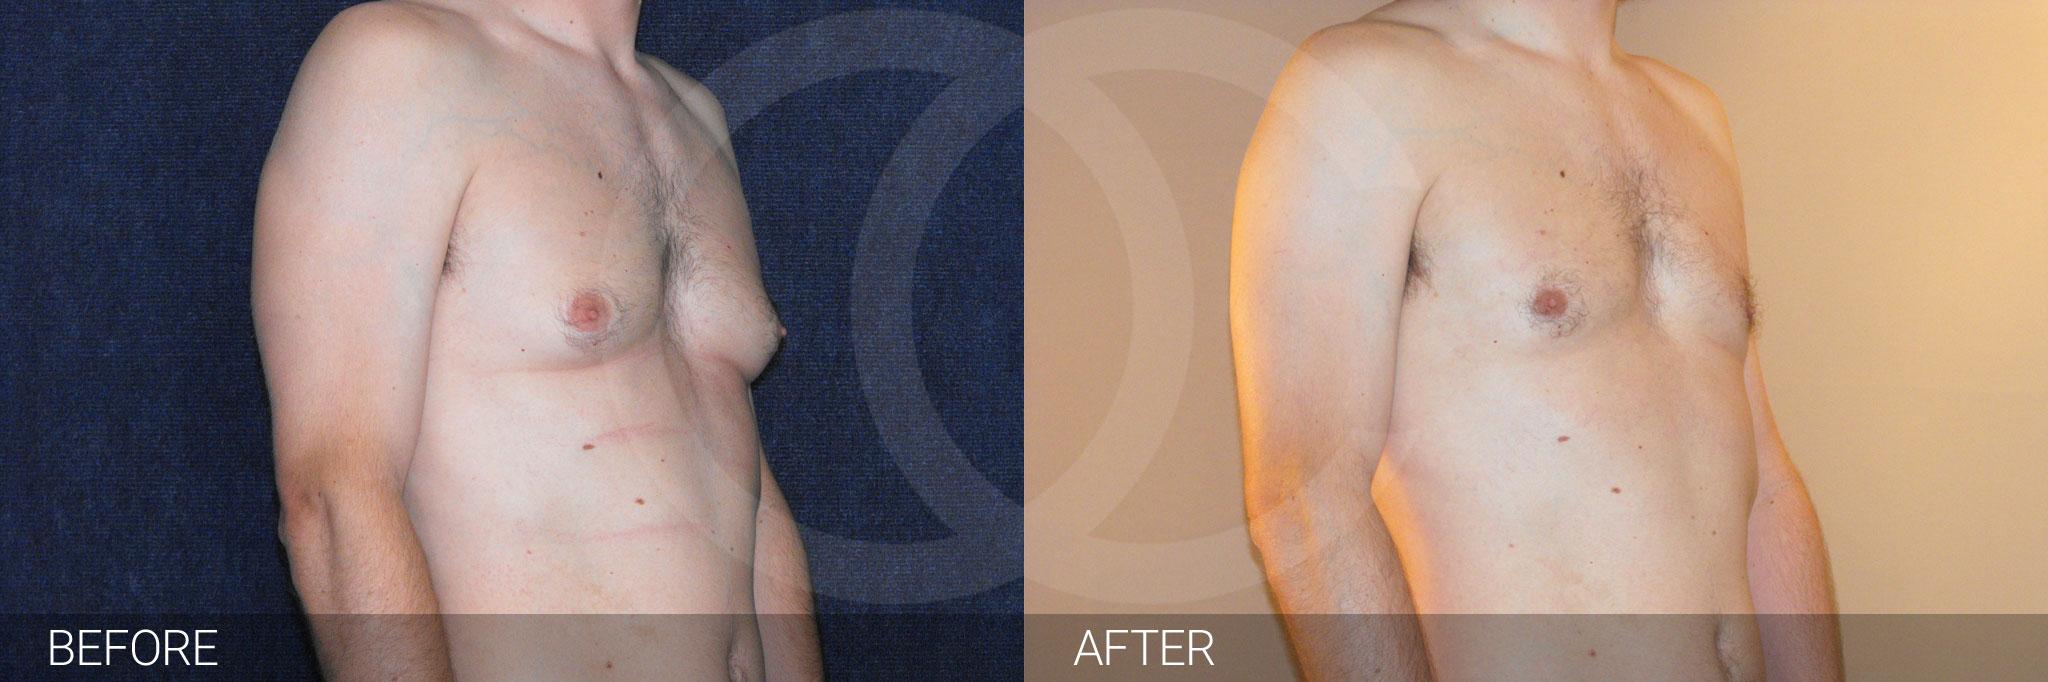 Gynecomastia with liposuction ante/post-op II